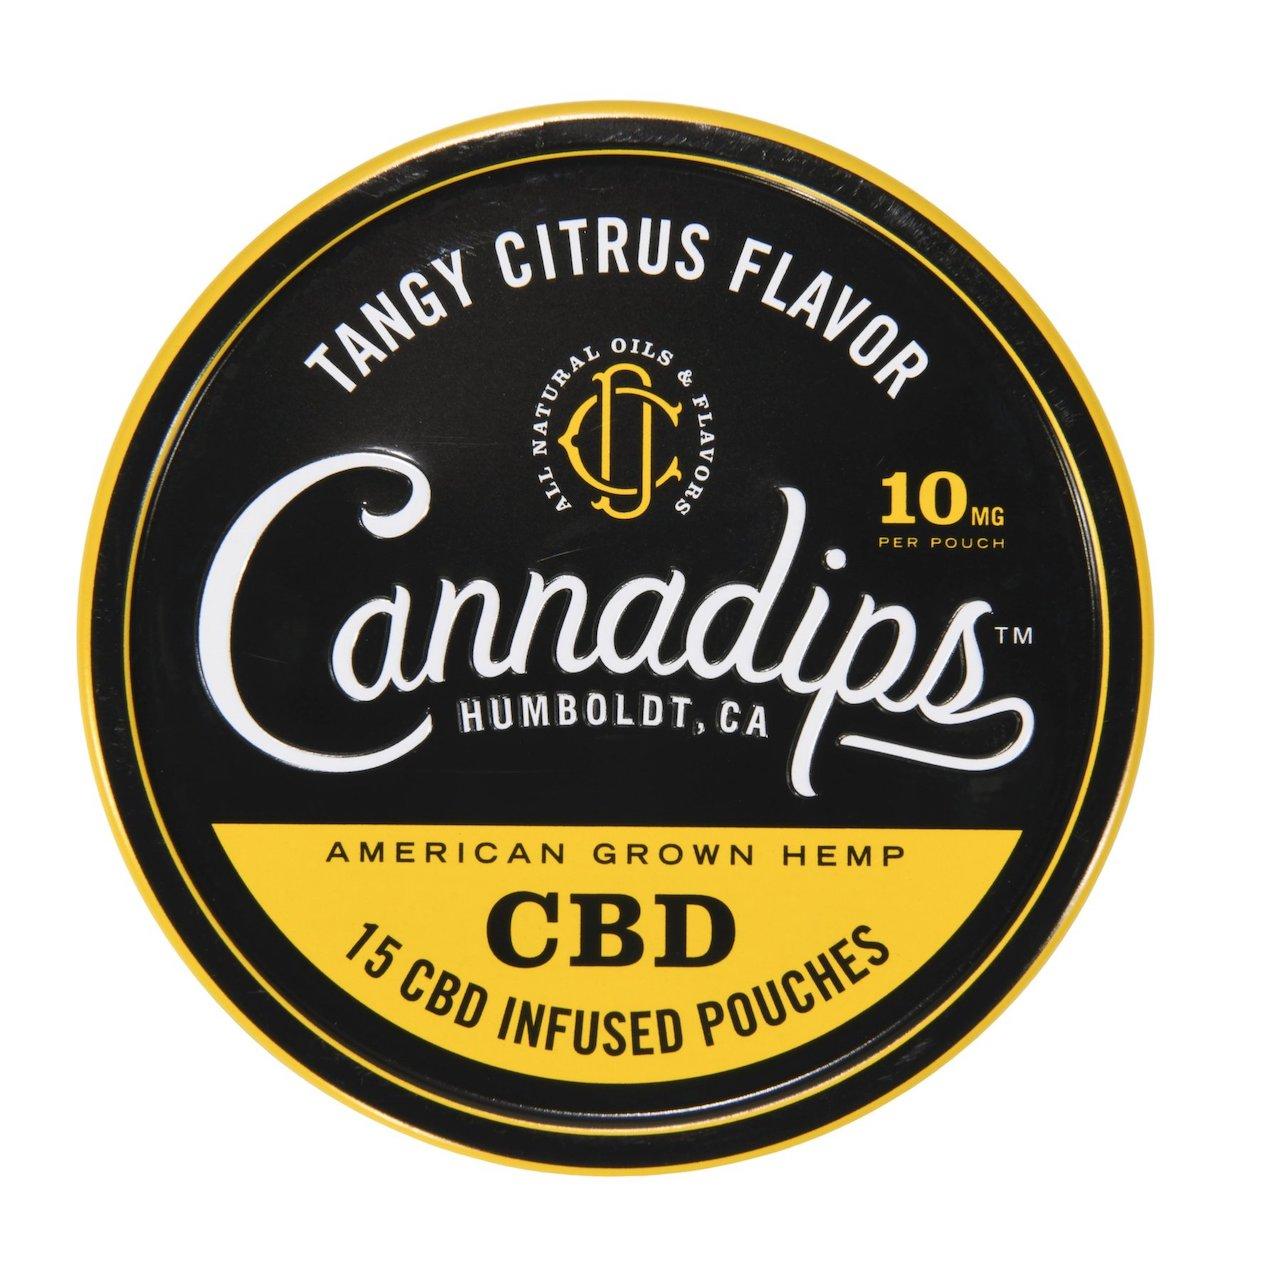 CBD cannadips - Citrus